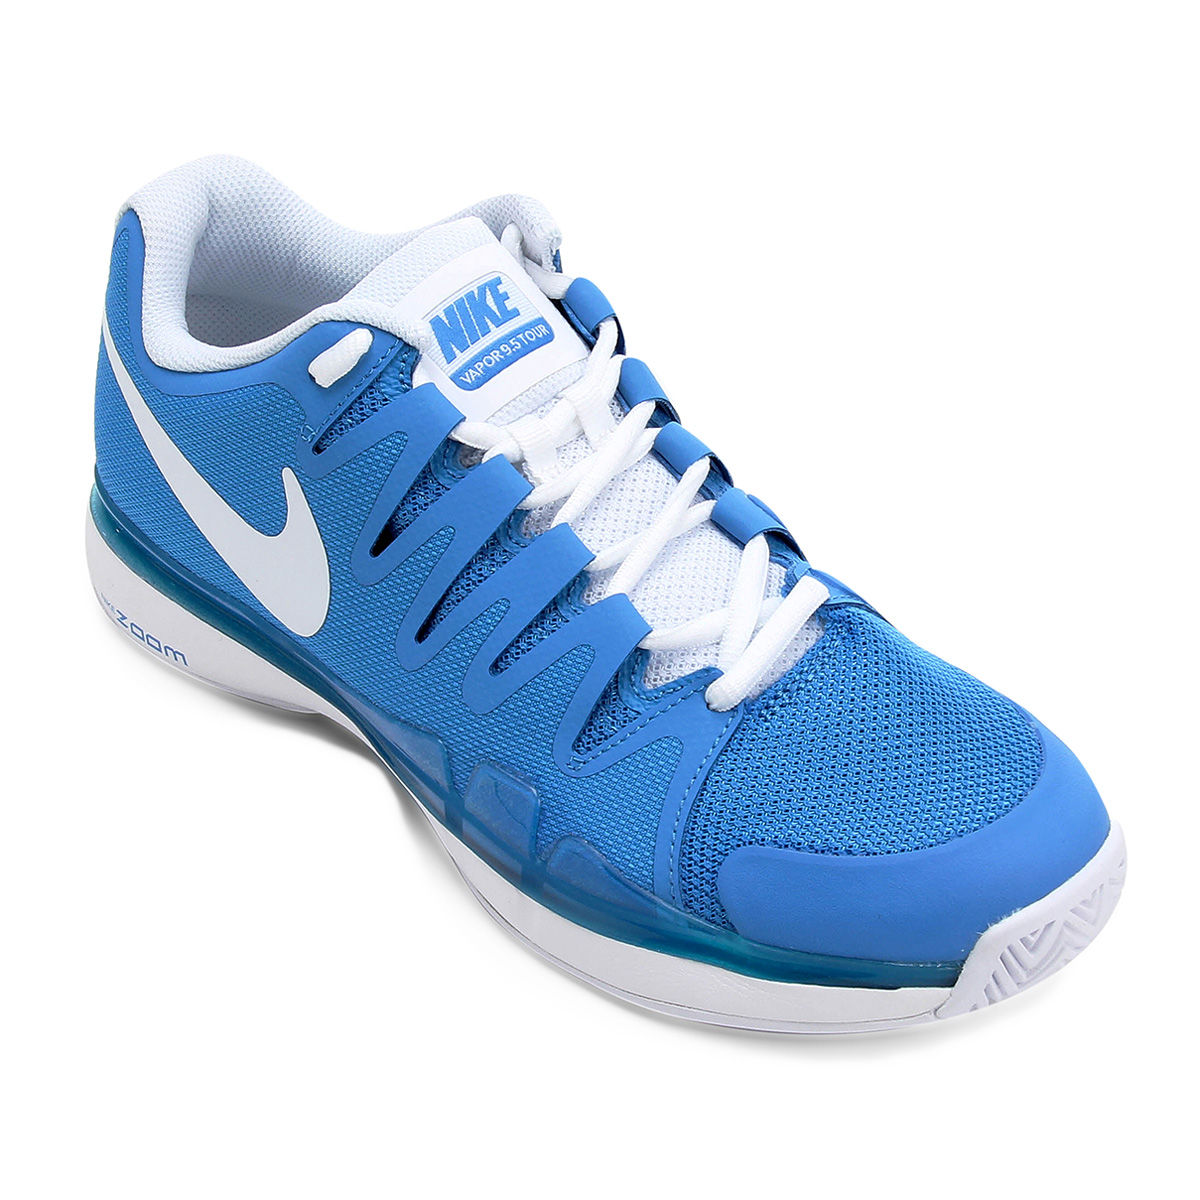 Tênis Nike Vapor 9.5 Tour Azul d67a7707f1034